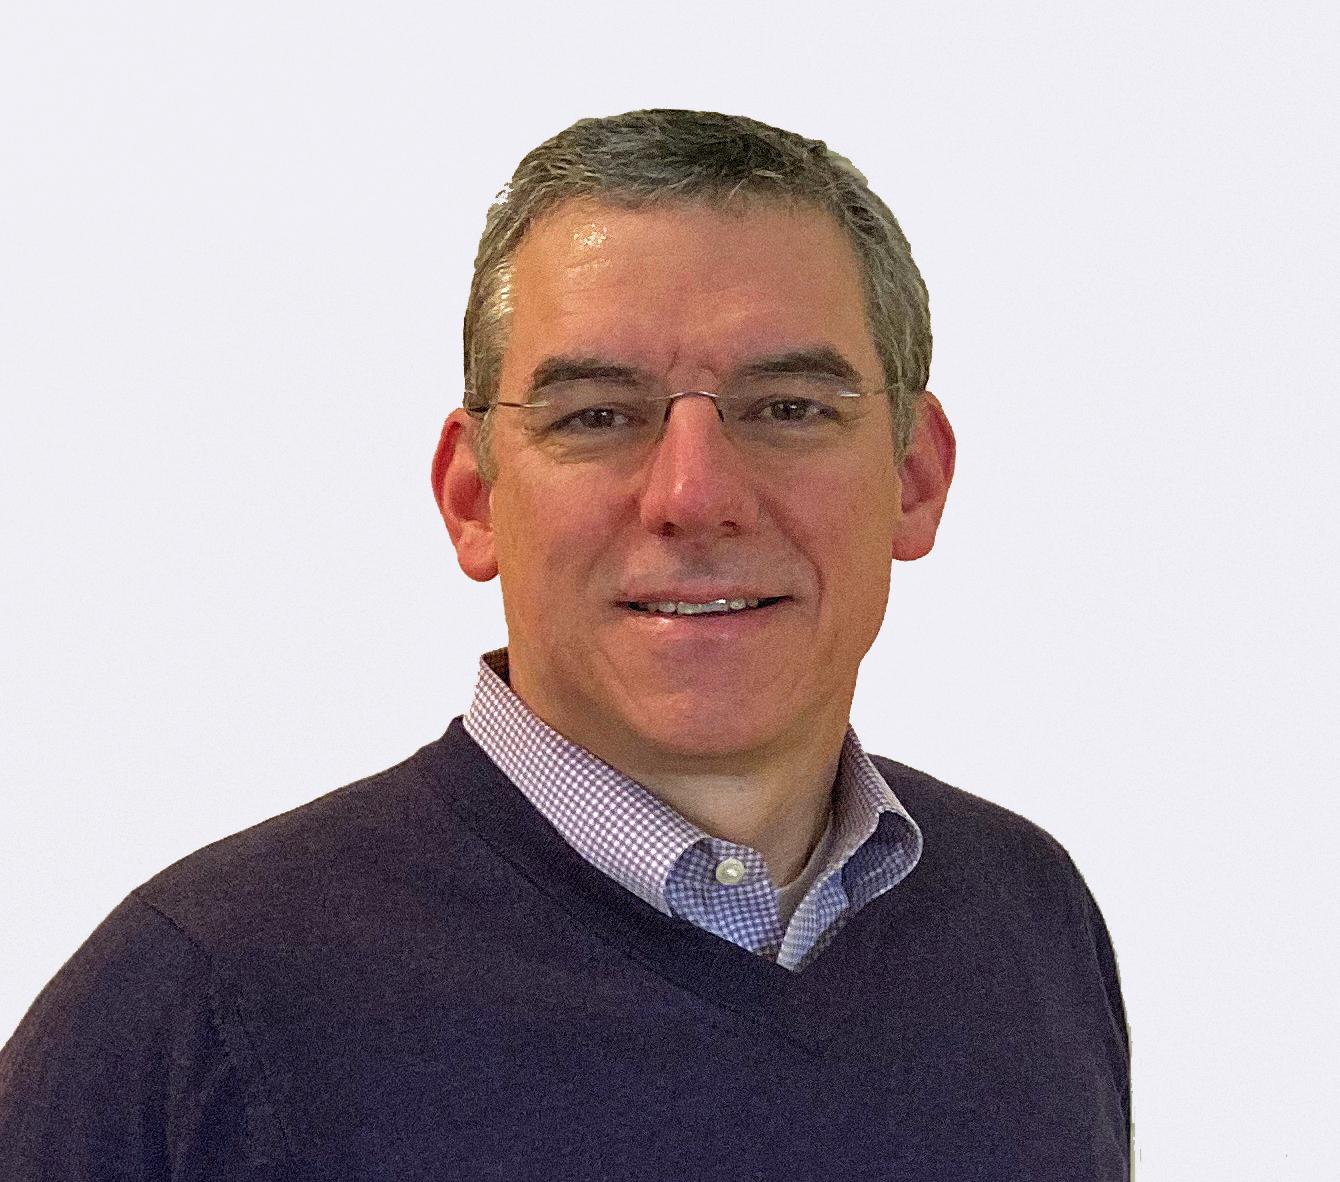 Jim Hurst